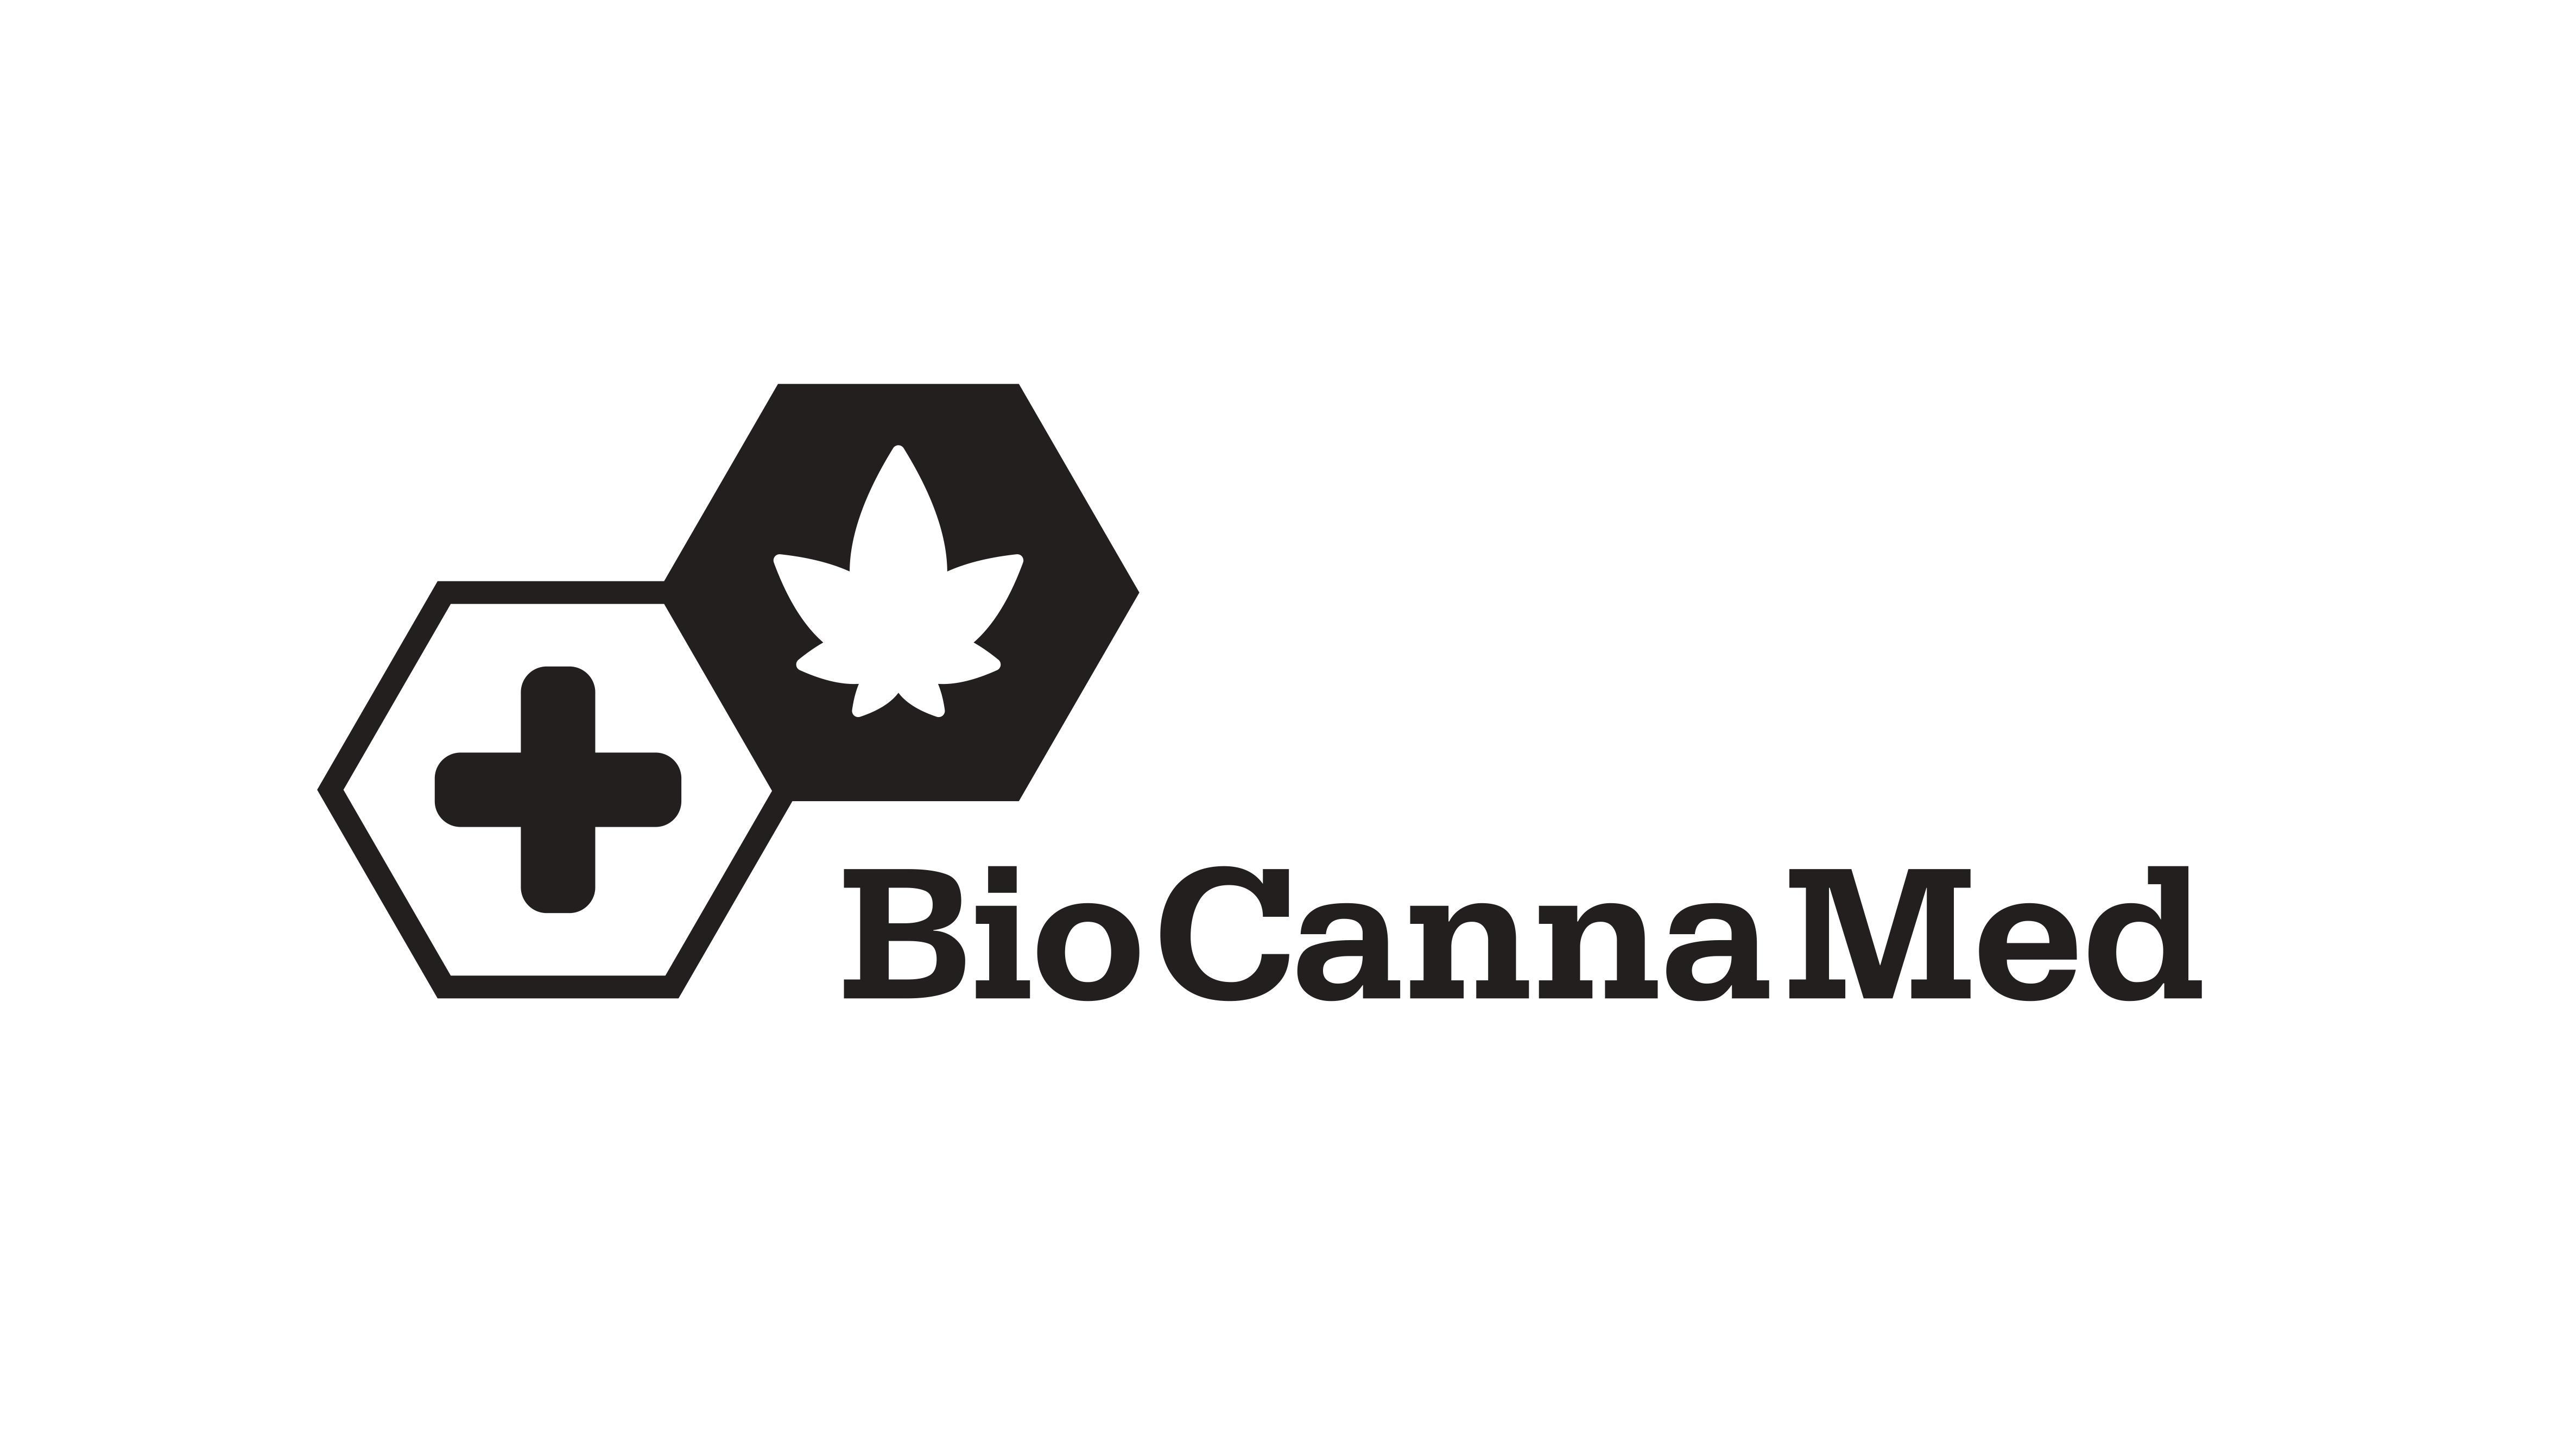 BiocannaMed